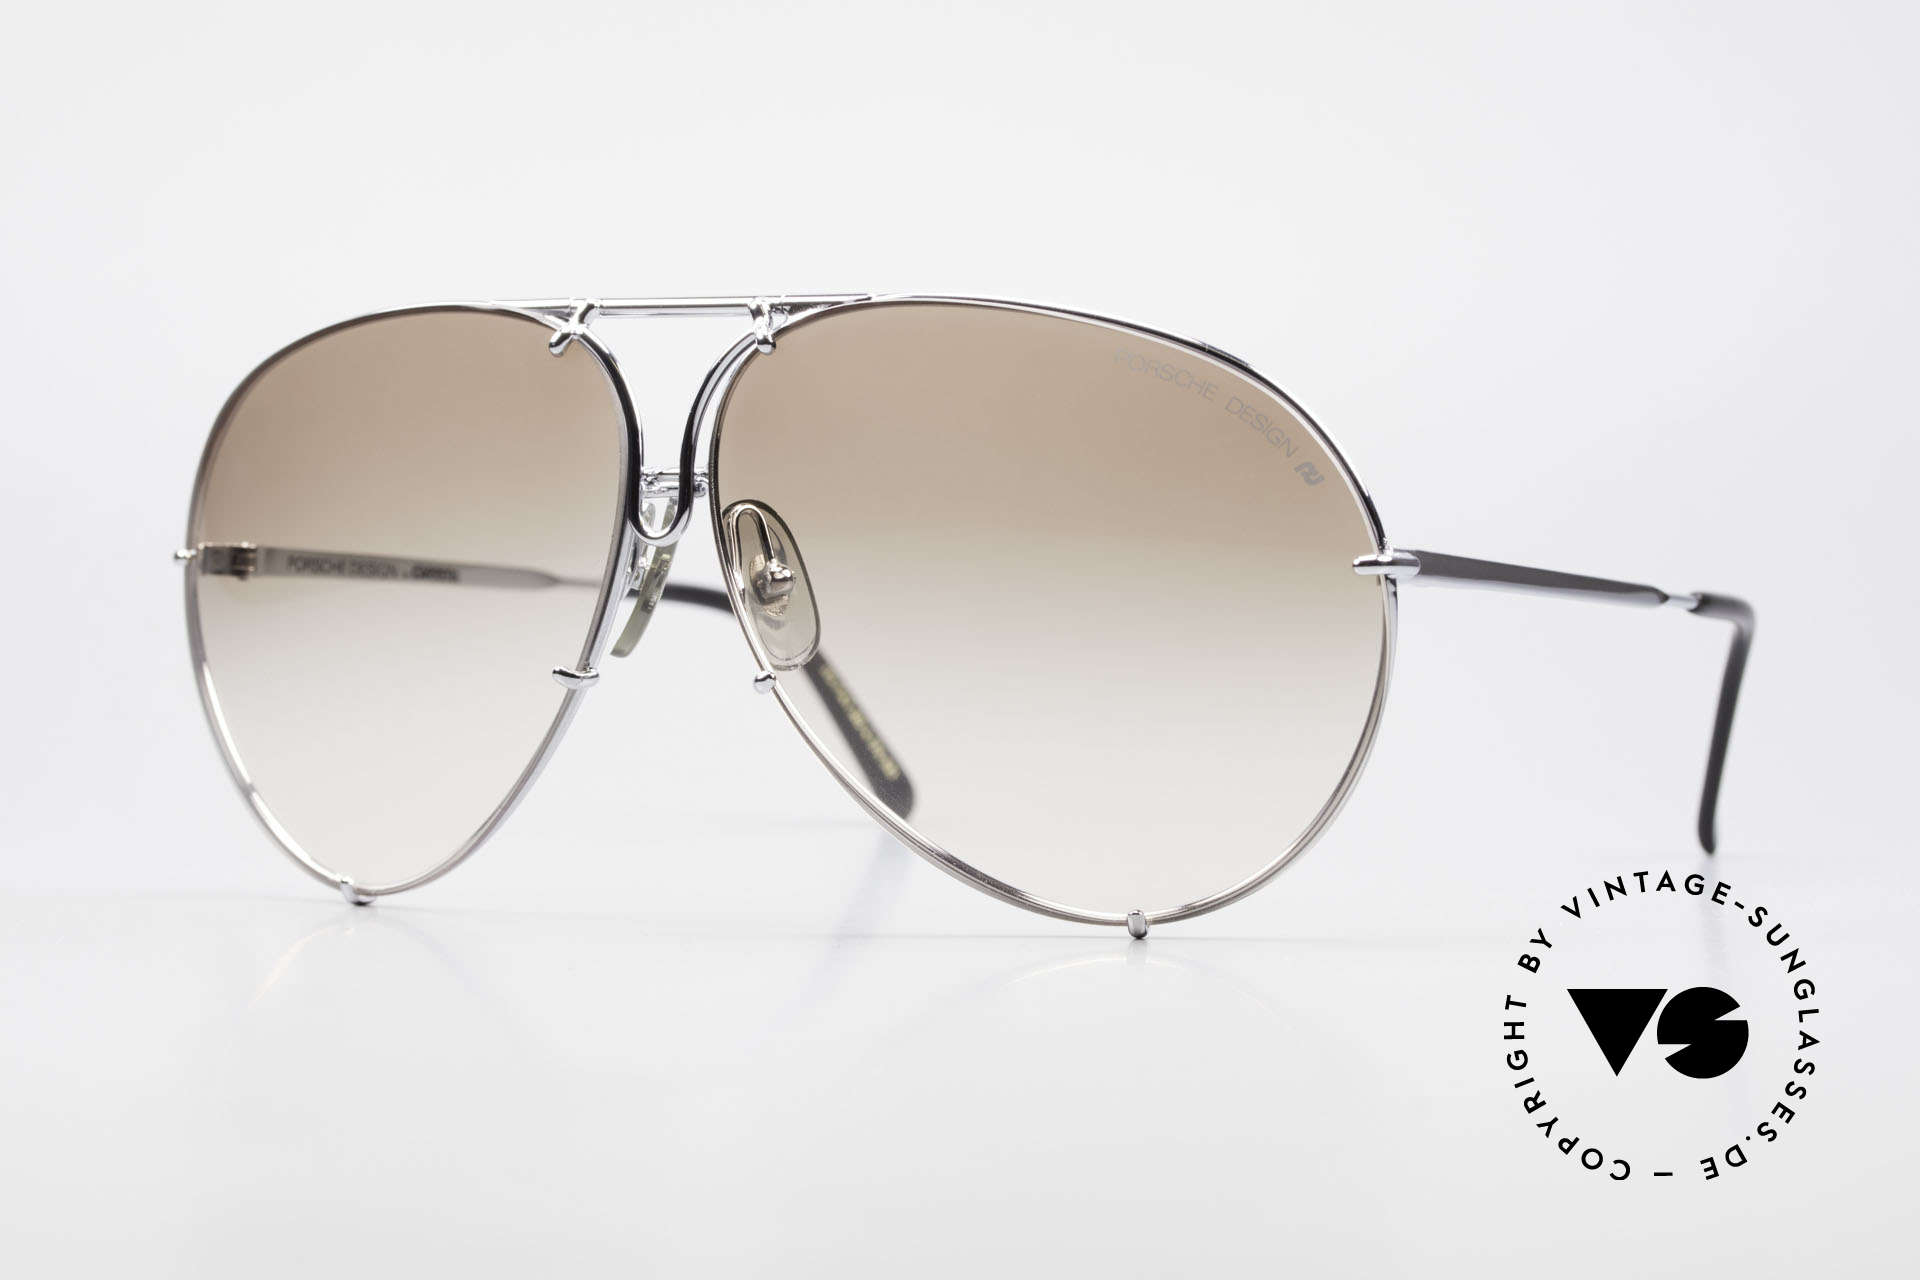 Porsche 5621 80's Sunglass Classic For Men, old 80's Porsche sunglasses with changeable lenses, Made for Men